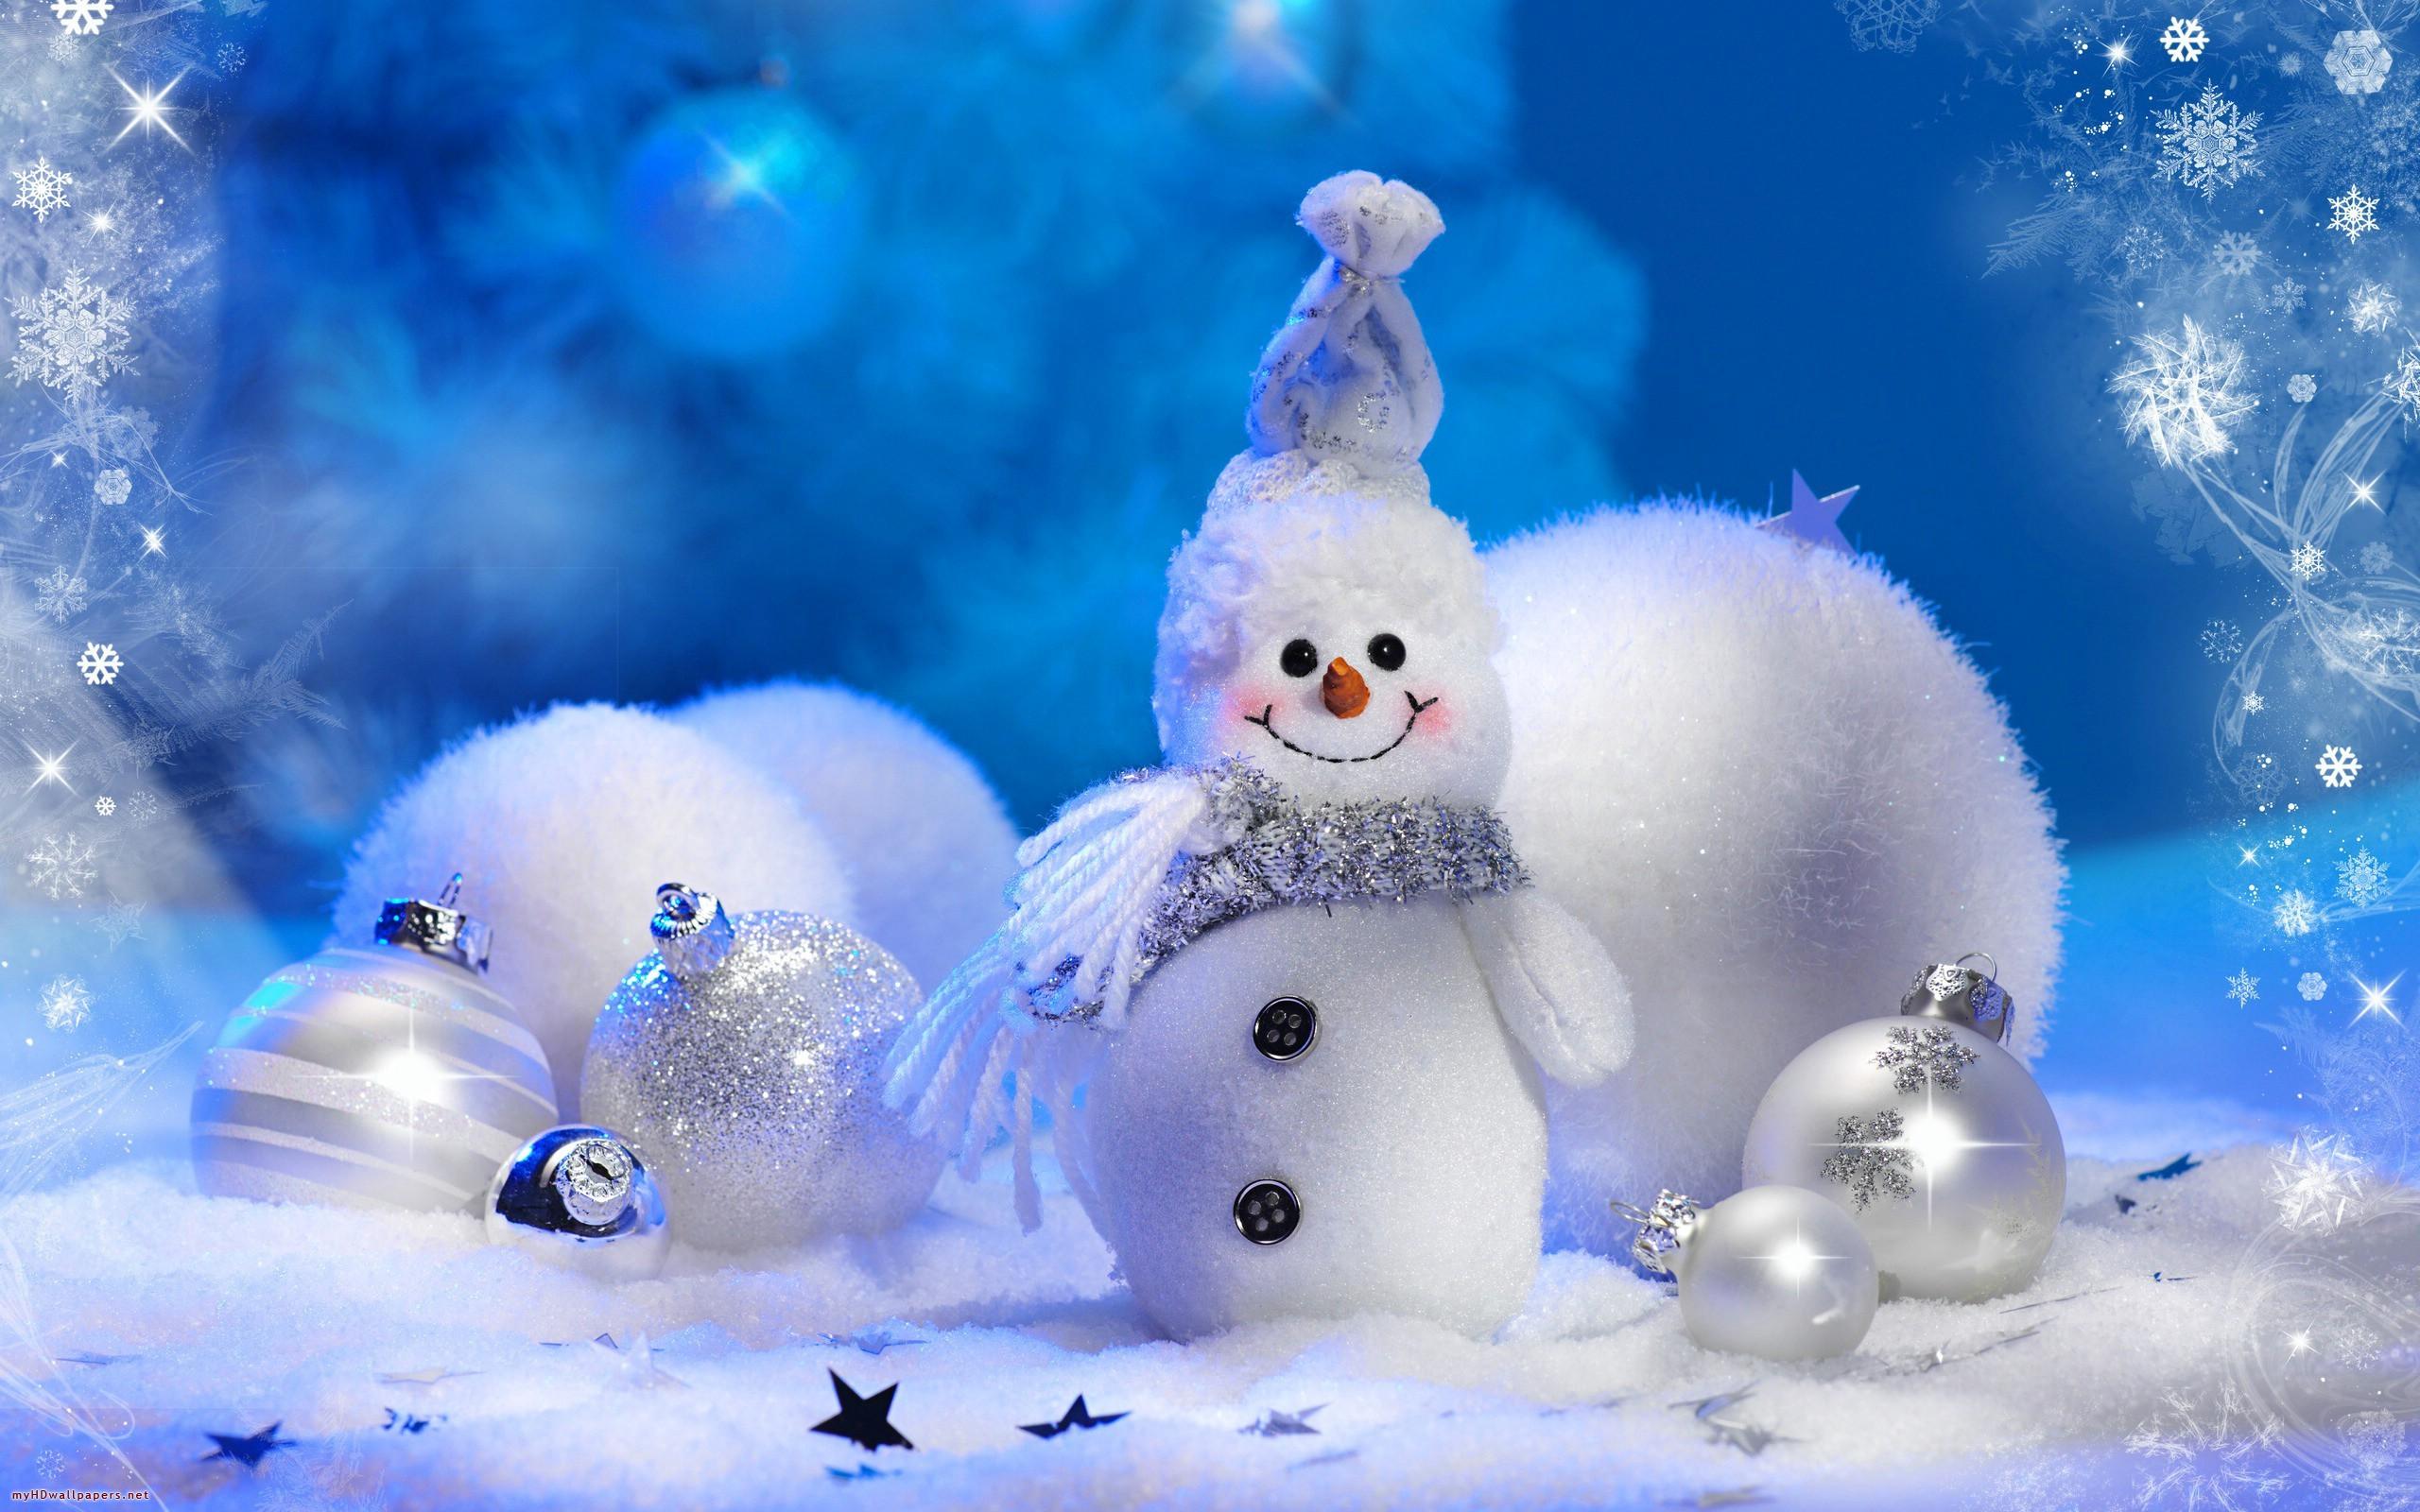 Cute Christmas Wallpaper Cute Wallpapers 2560x1600